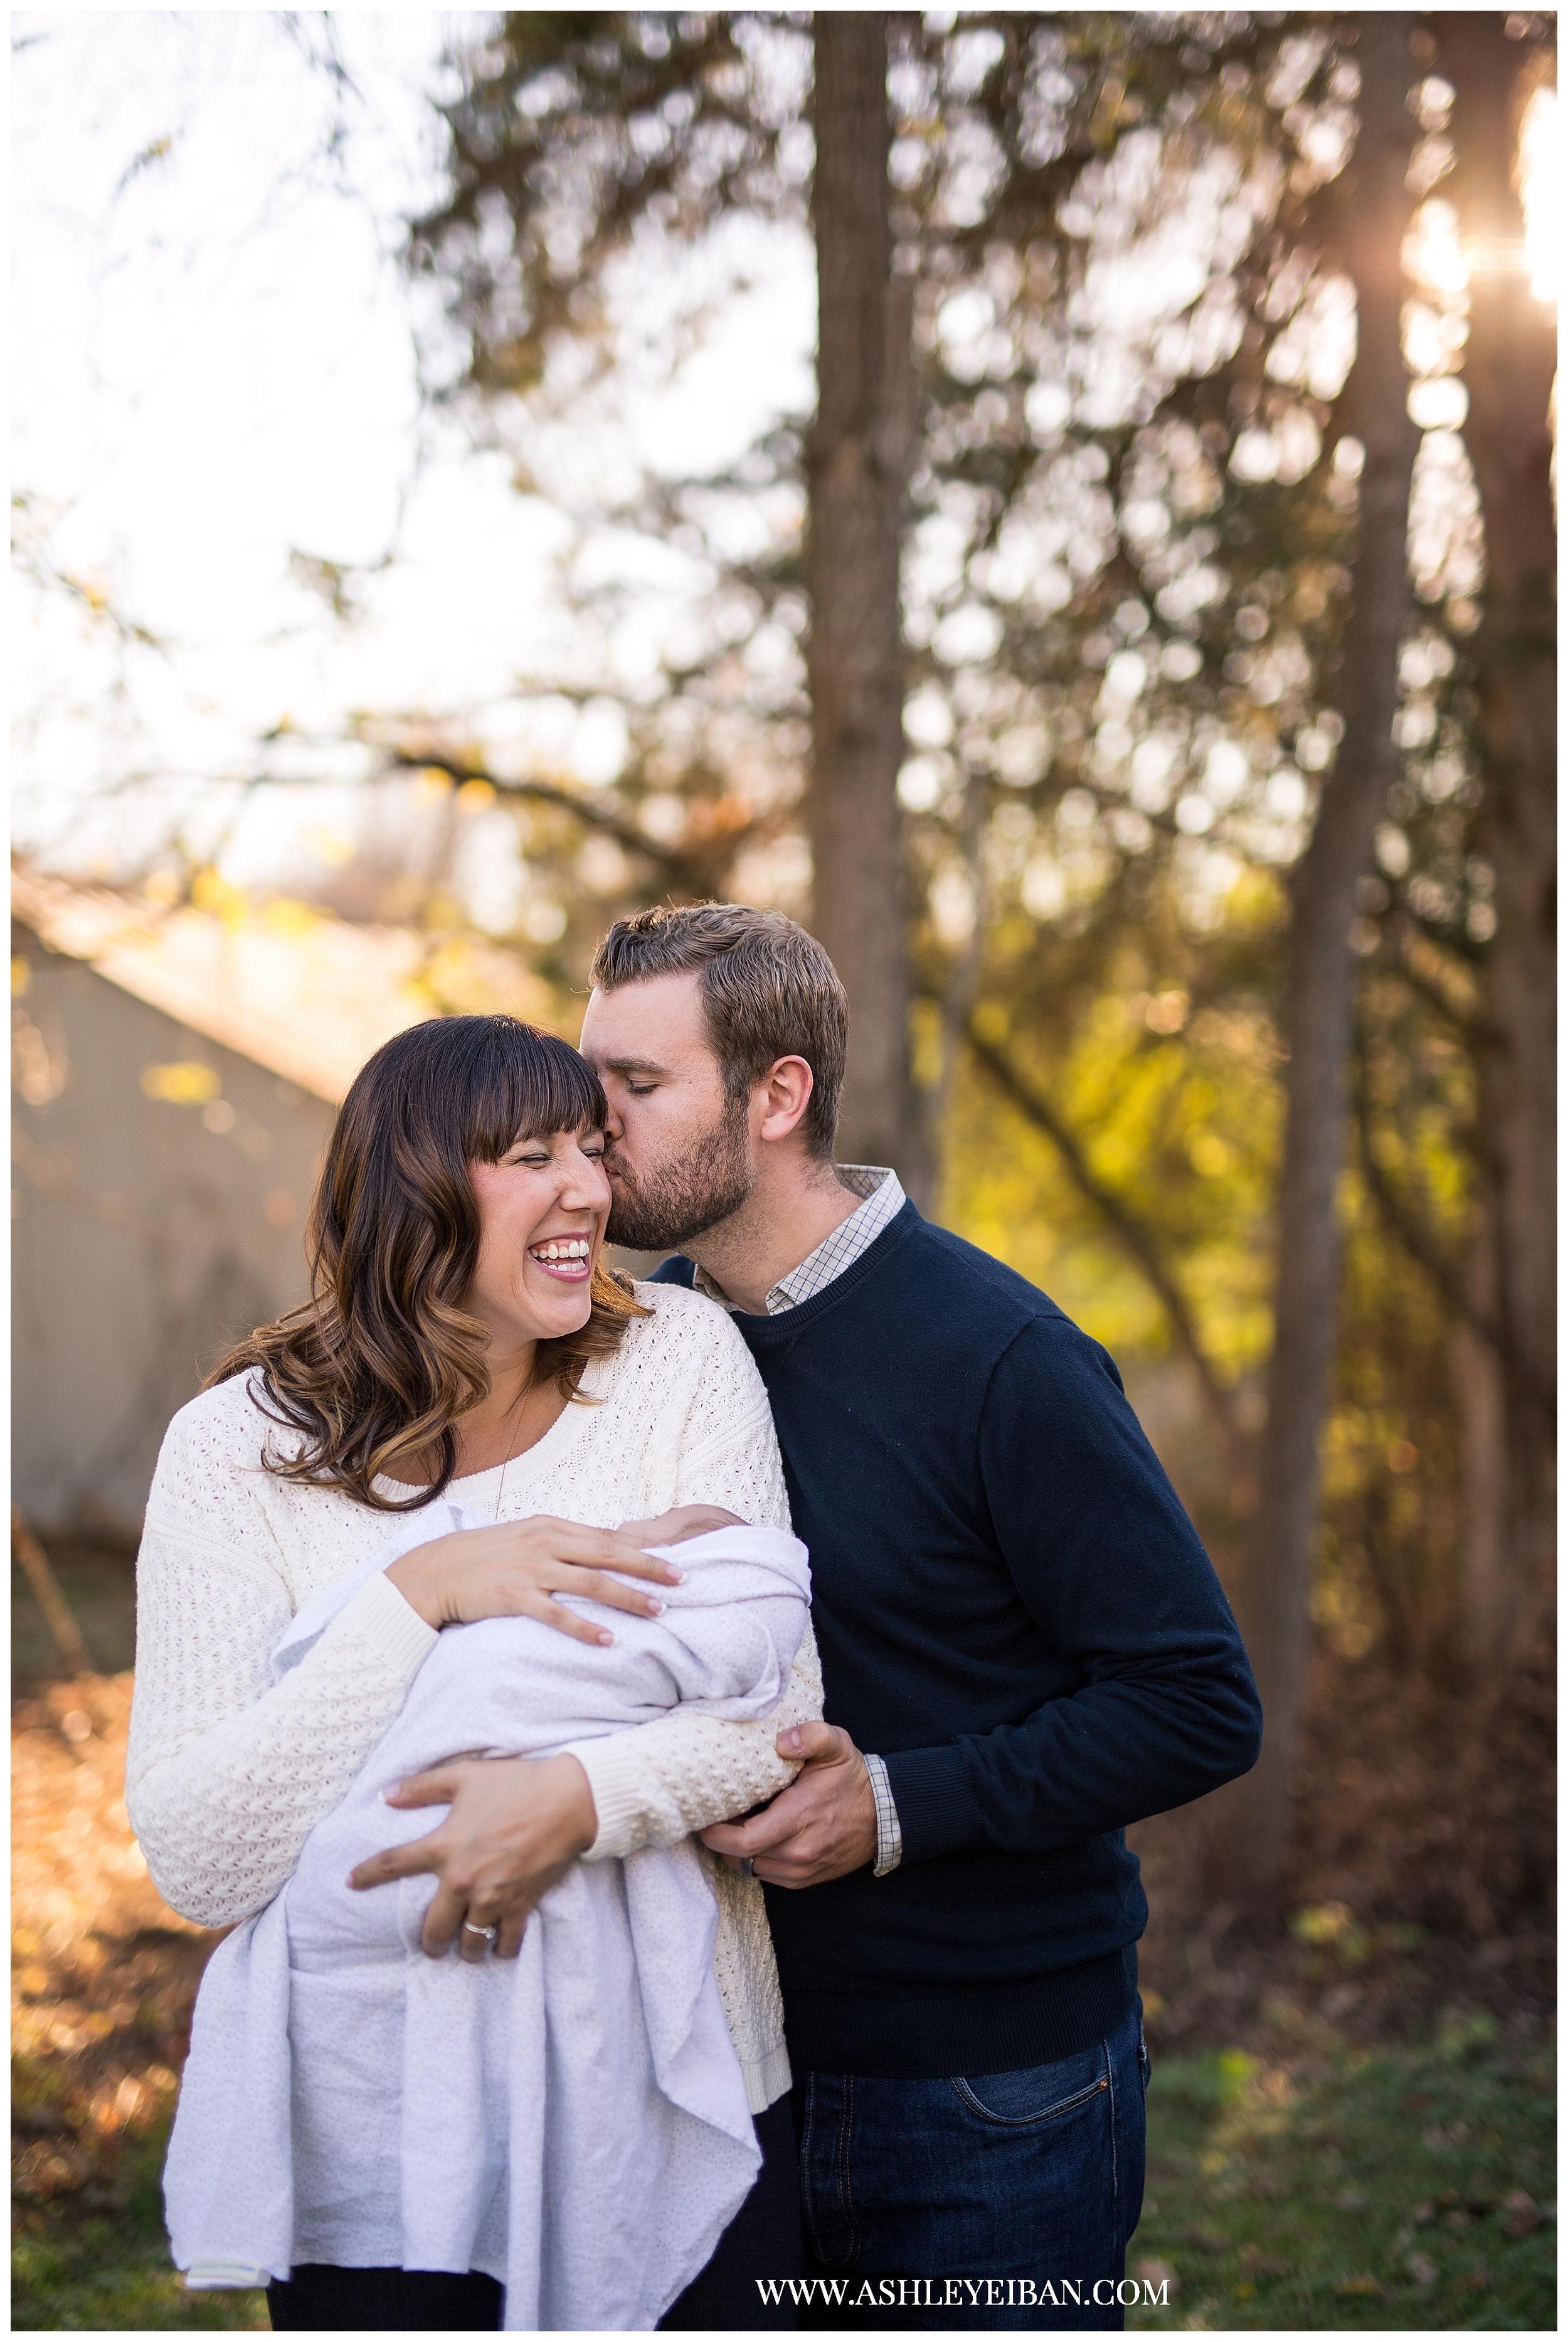 Wedding & Portrait Photographer in Lynchburg, VA || Central VA Family Photographer || Ashley Eiban Photography || www.ashleyeiban.com